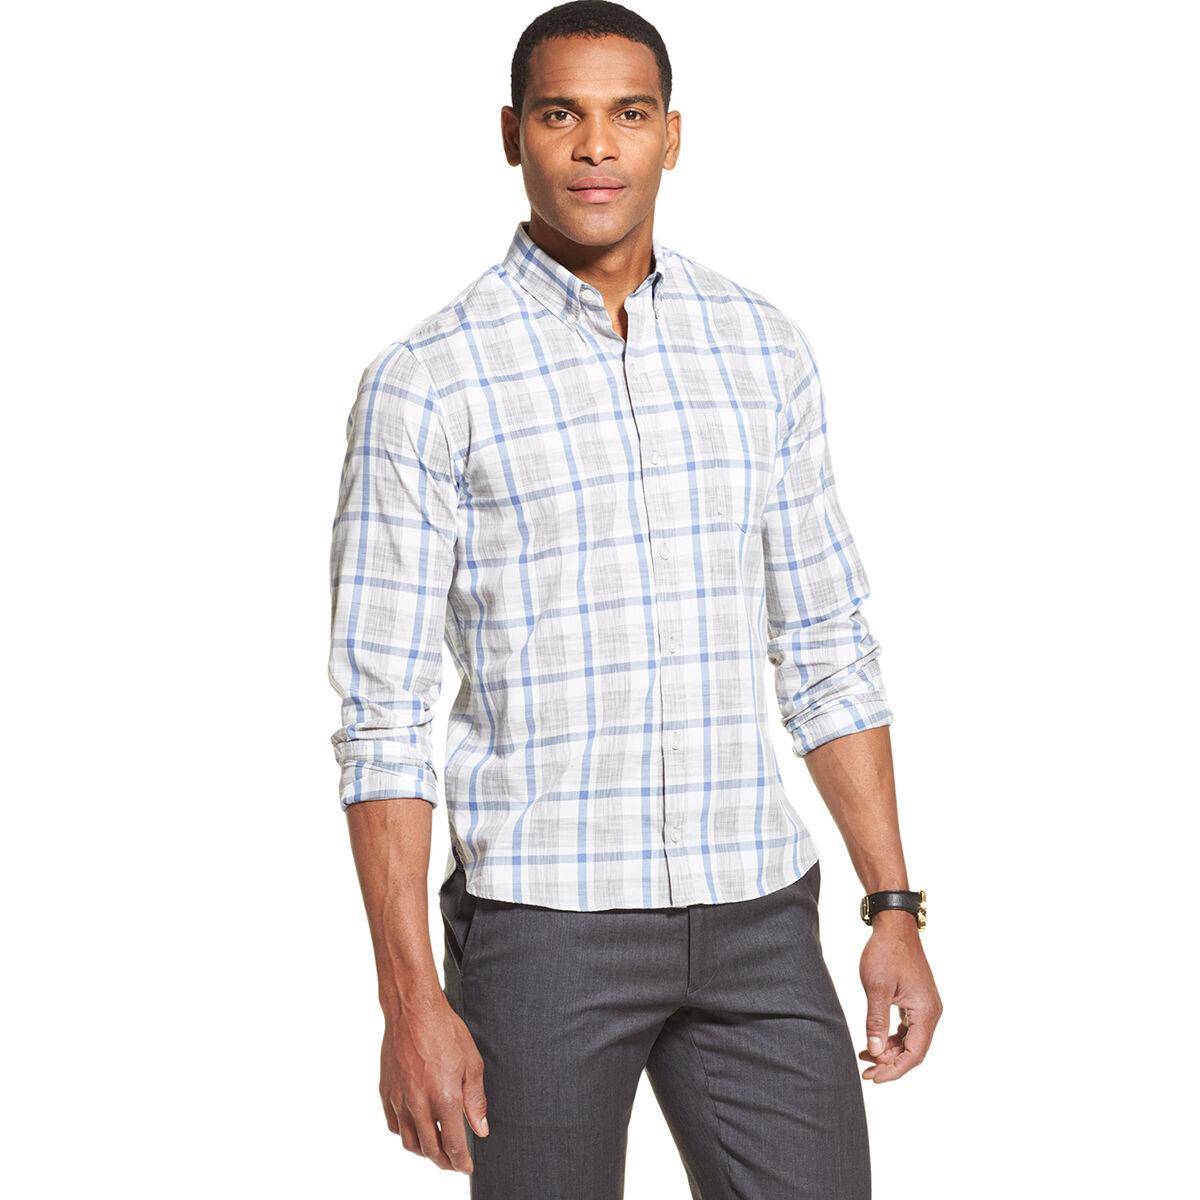 Van Heusen Men's Never Tuck Long-Sleeve Slim Fit Shirt - Various Patterns, M